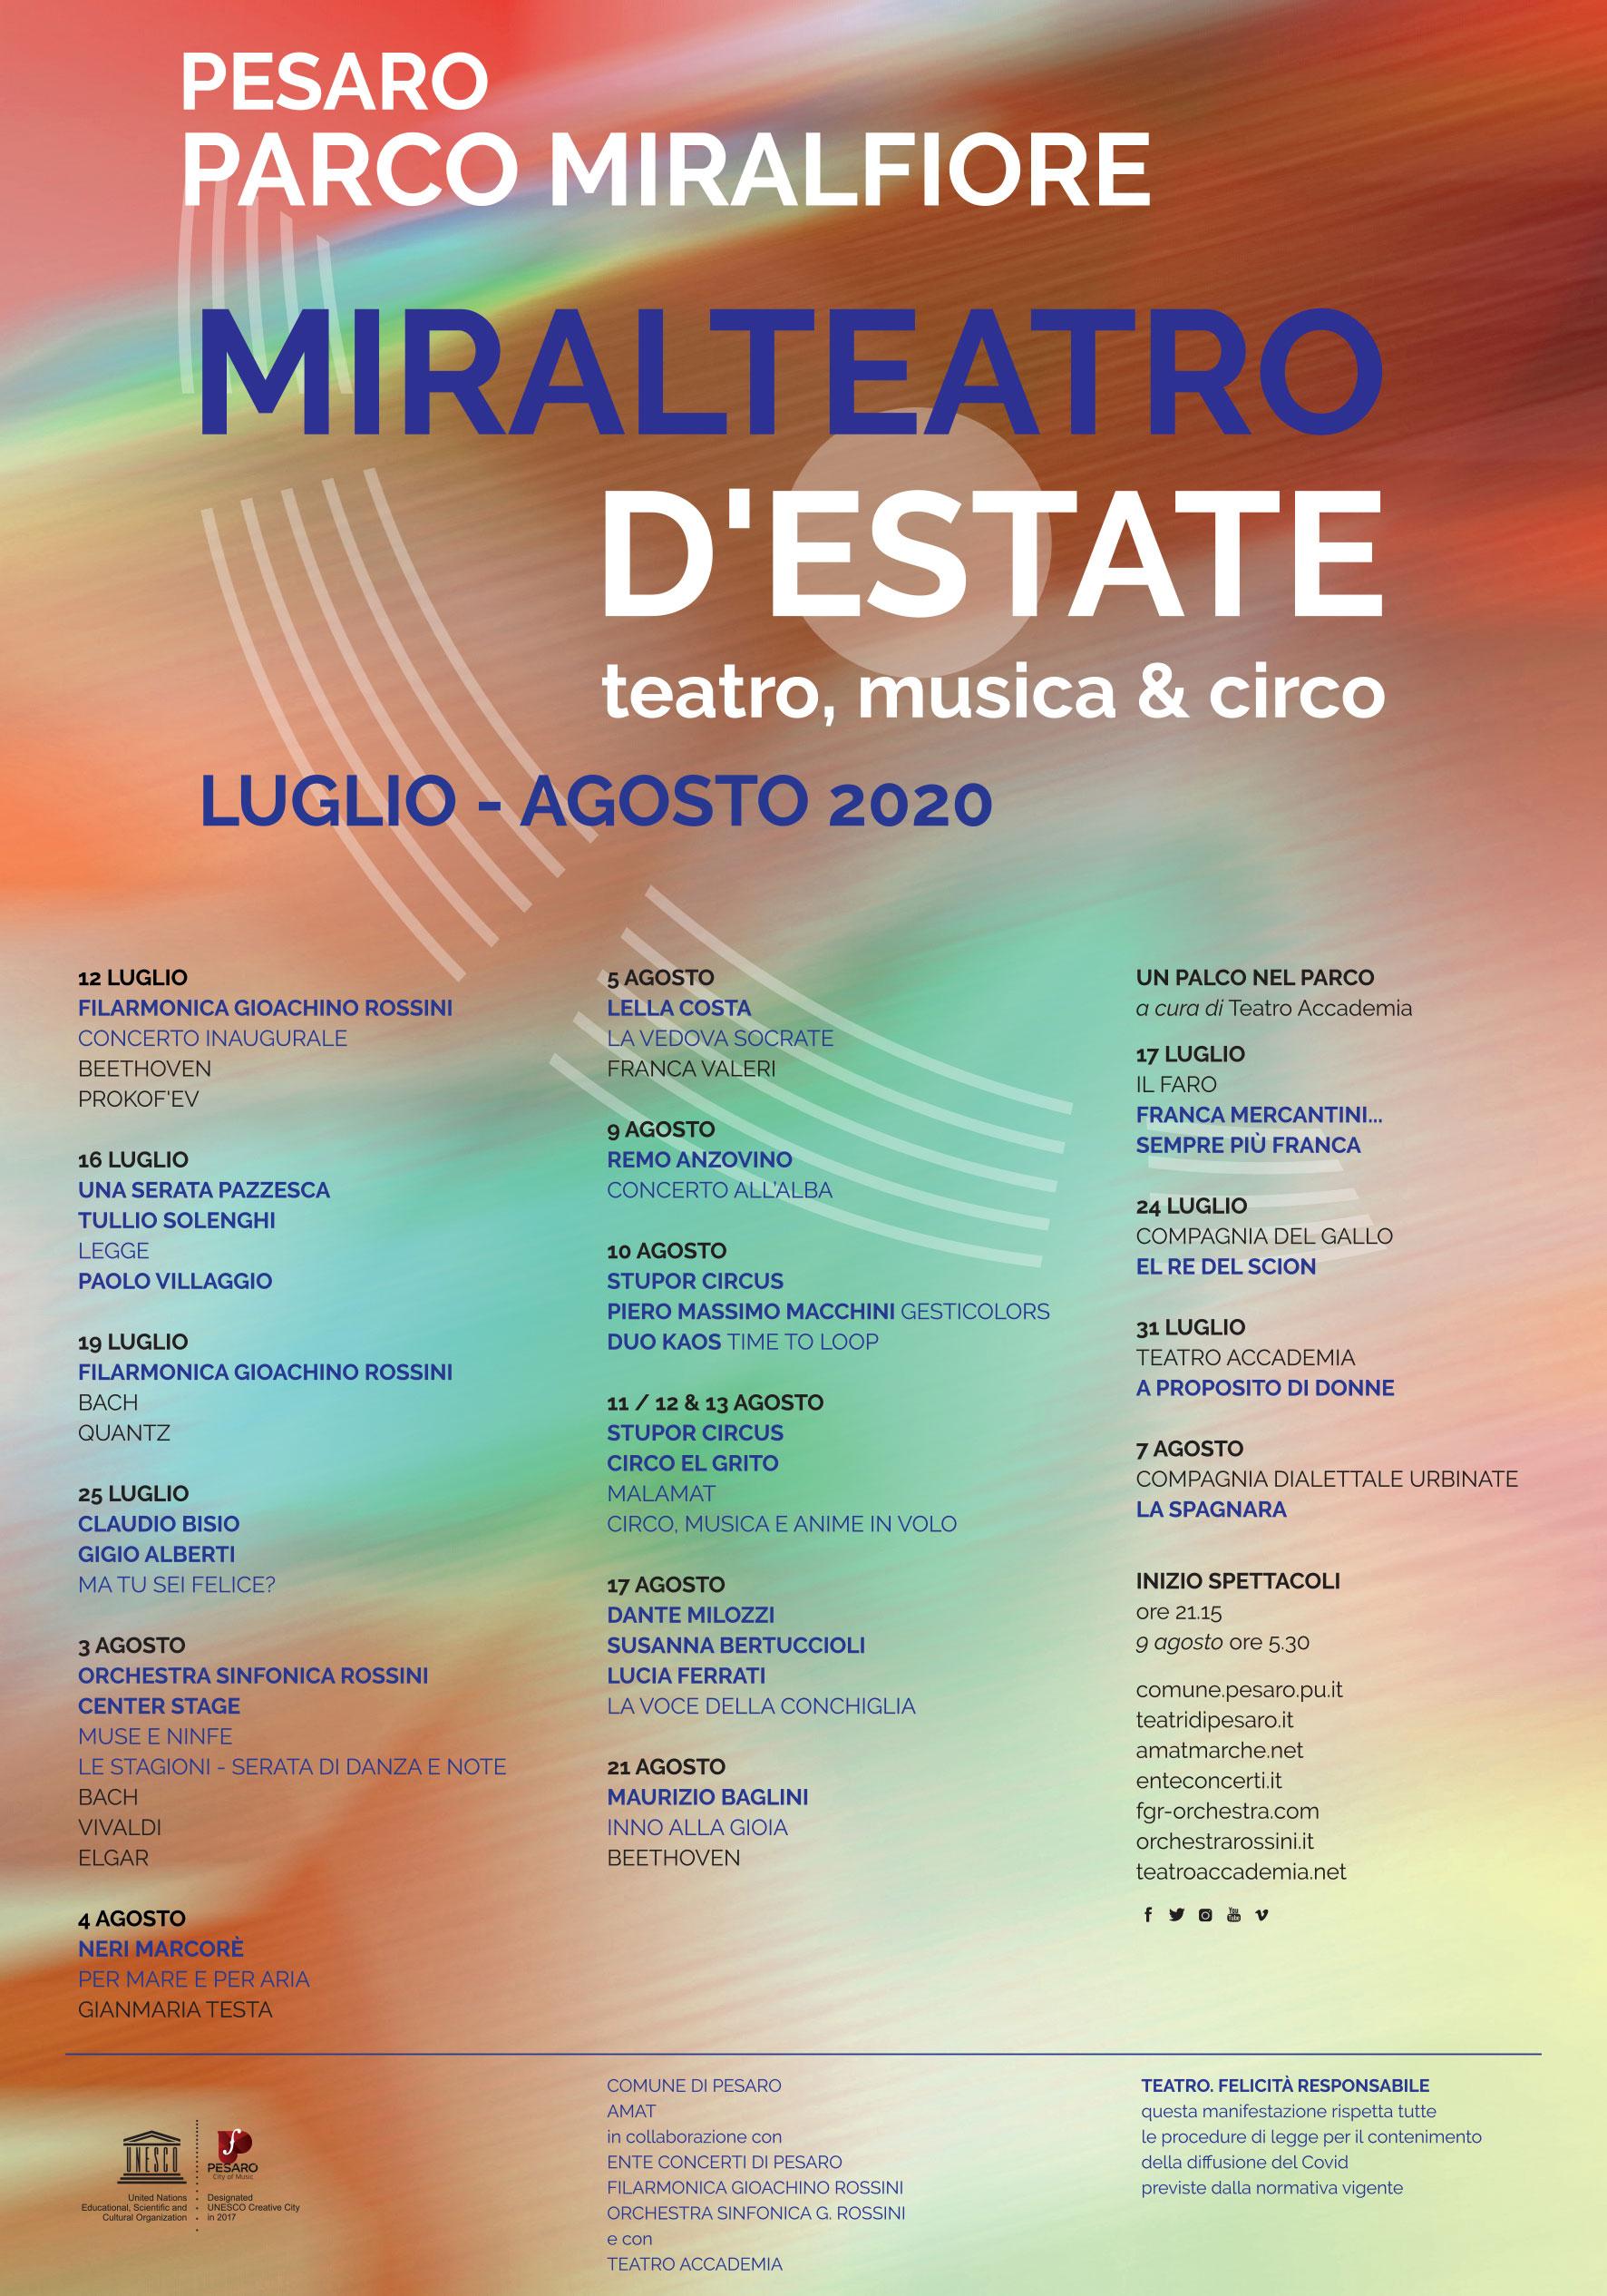 Pesaro | Miralteatro 2020